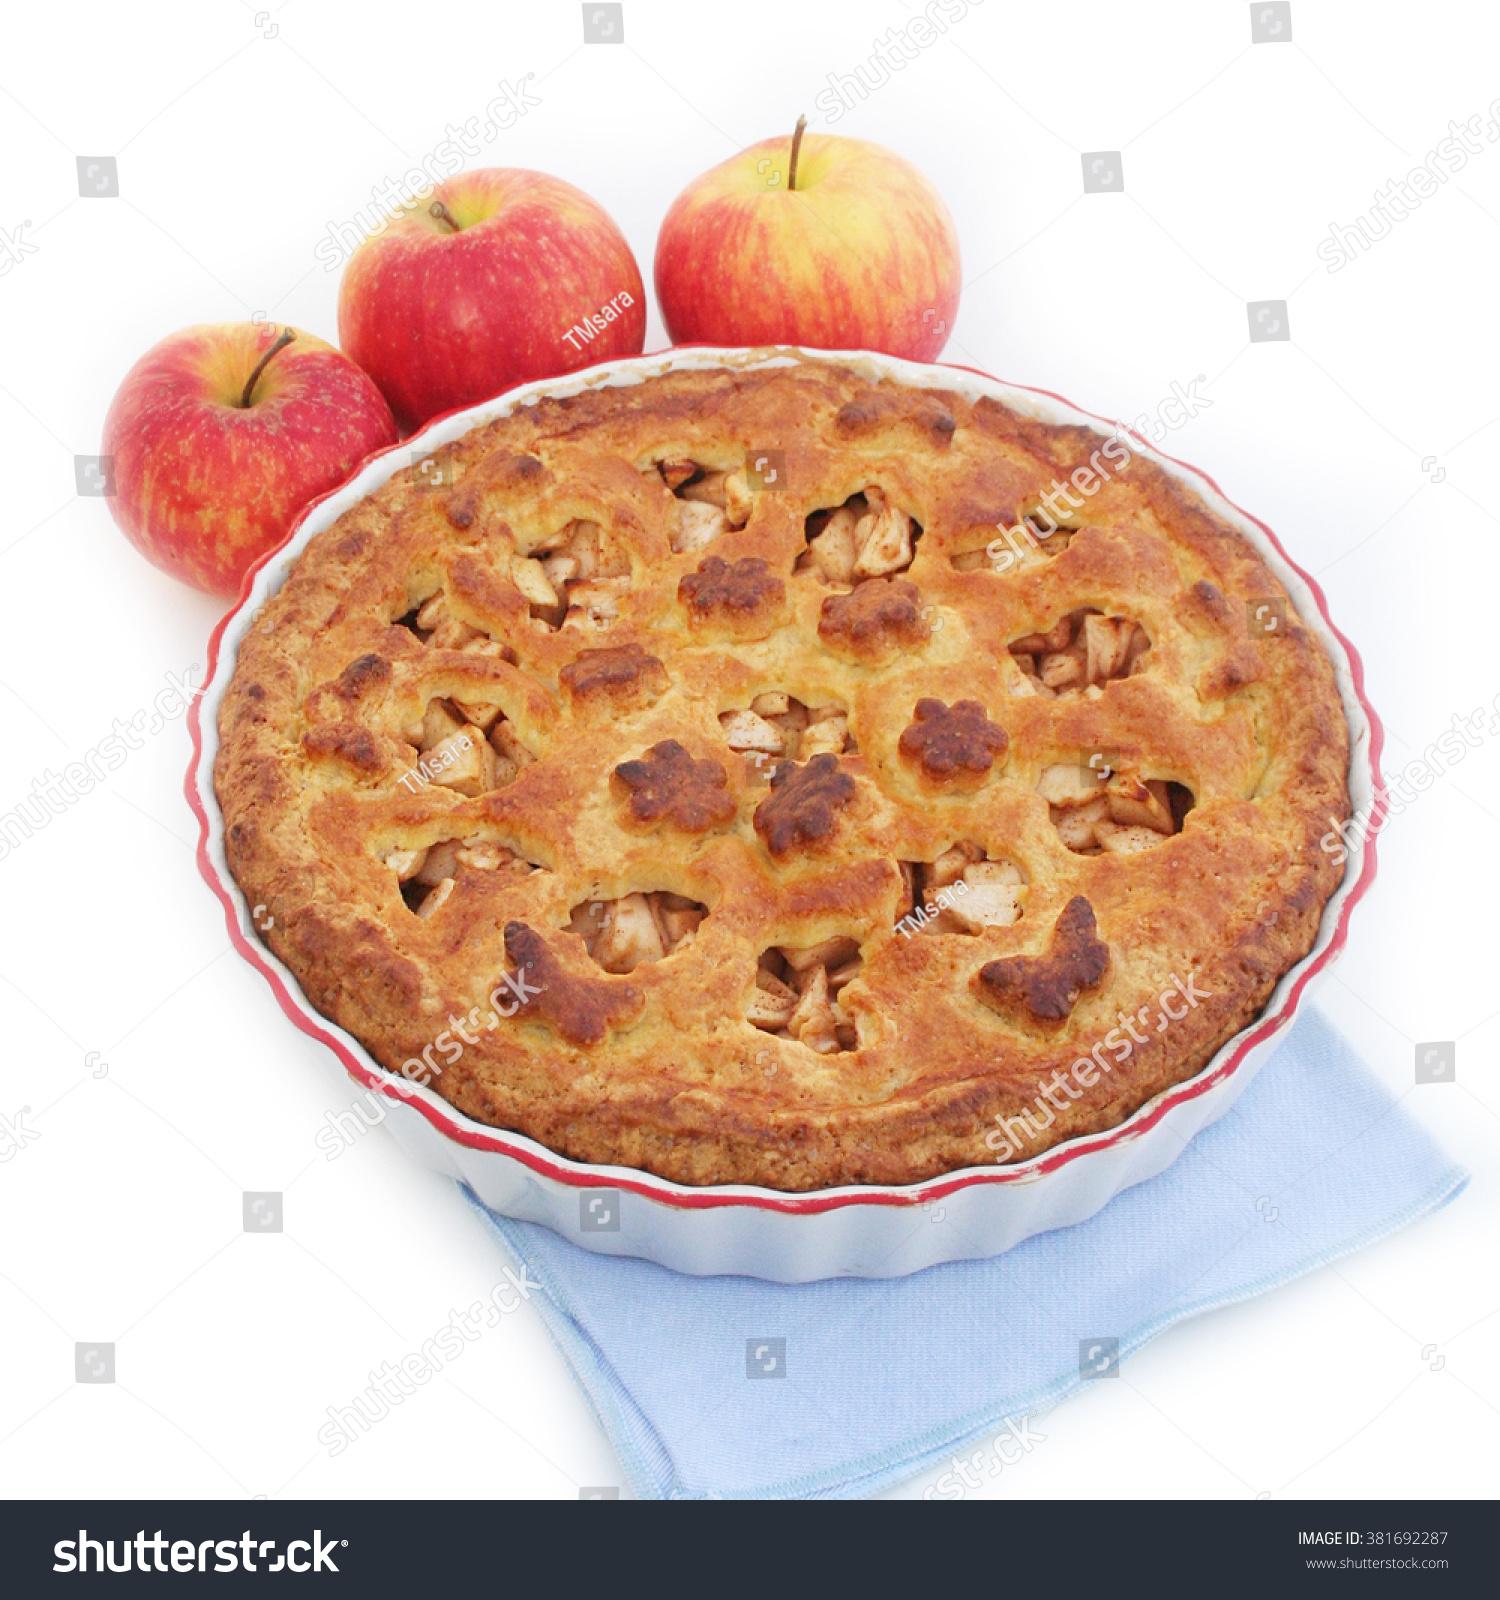 Homebaked Apple Pie On White Background Stock Photo (Royalty Free ...